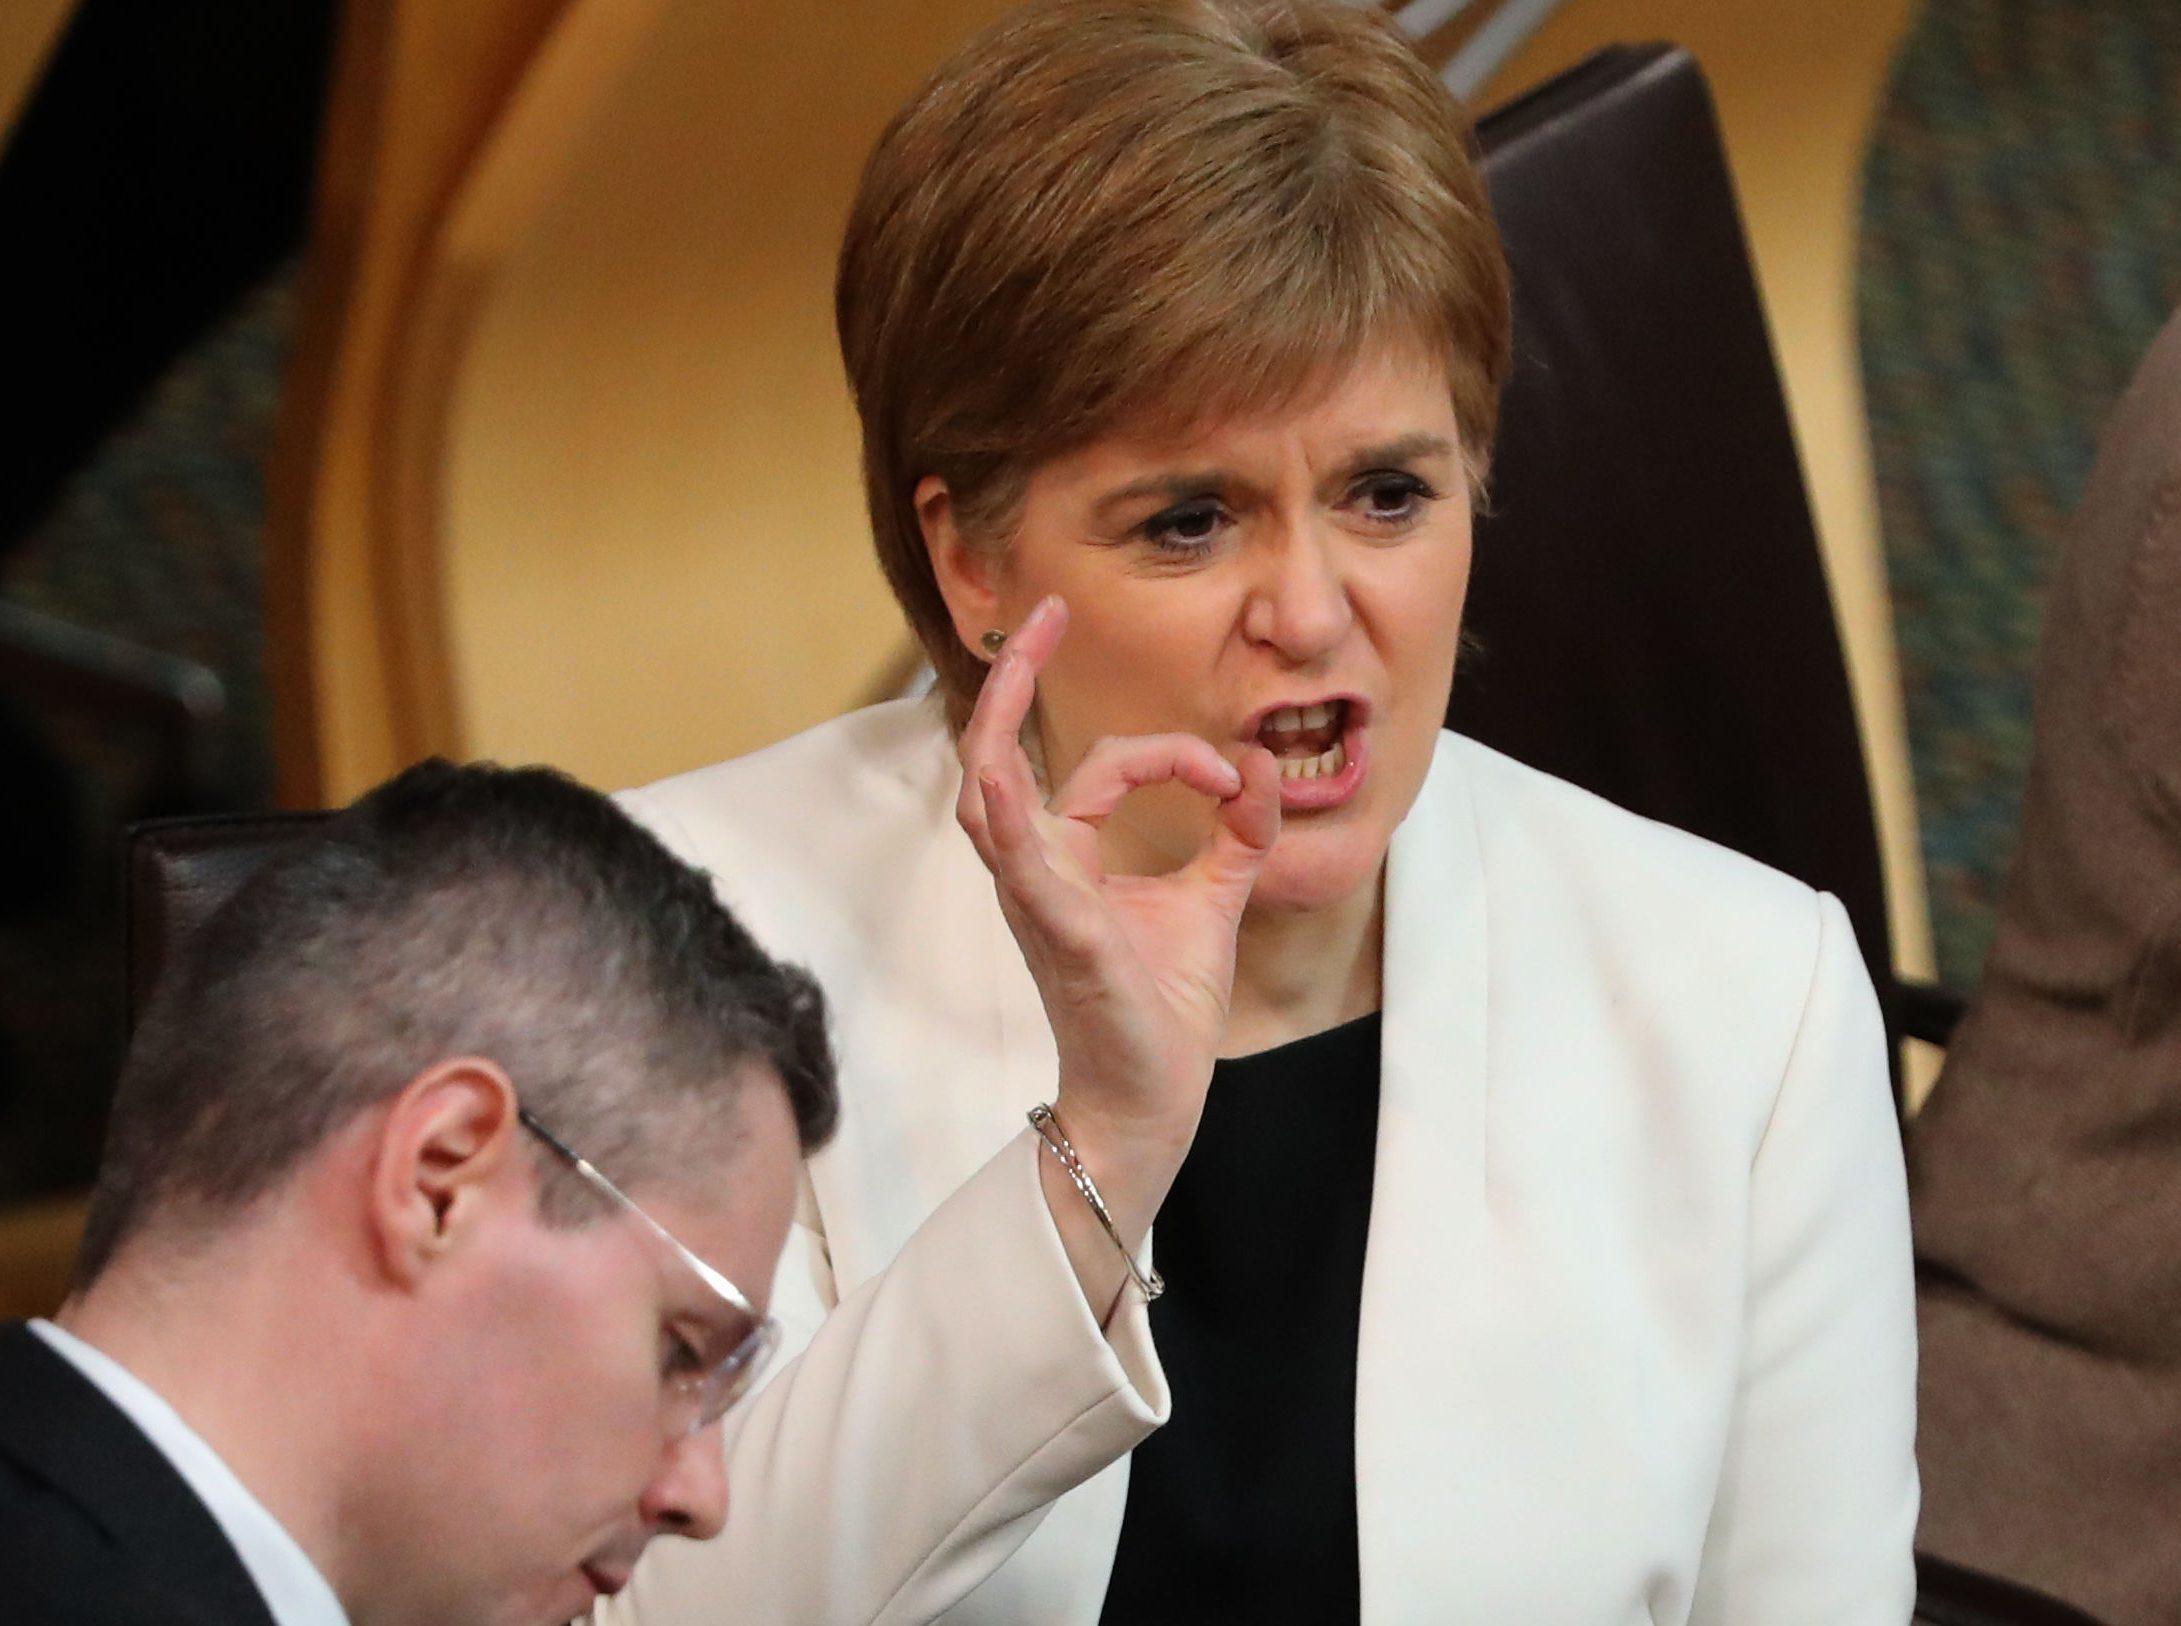 First Minister Nicola Sturgeon after Finance Secretary Derek Mackay's (left) speech during a Budget debate at the Scottish Parliament  (Andrew Milligan/PA Wire)